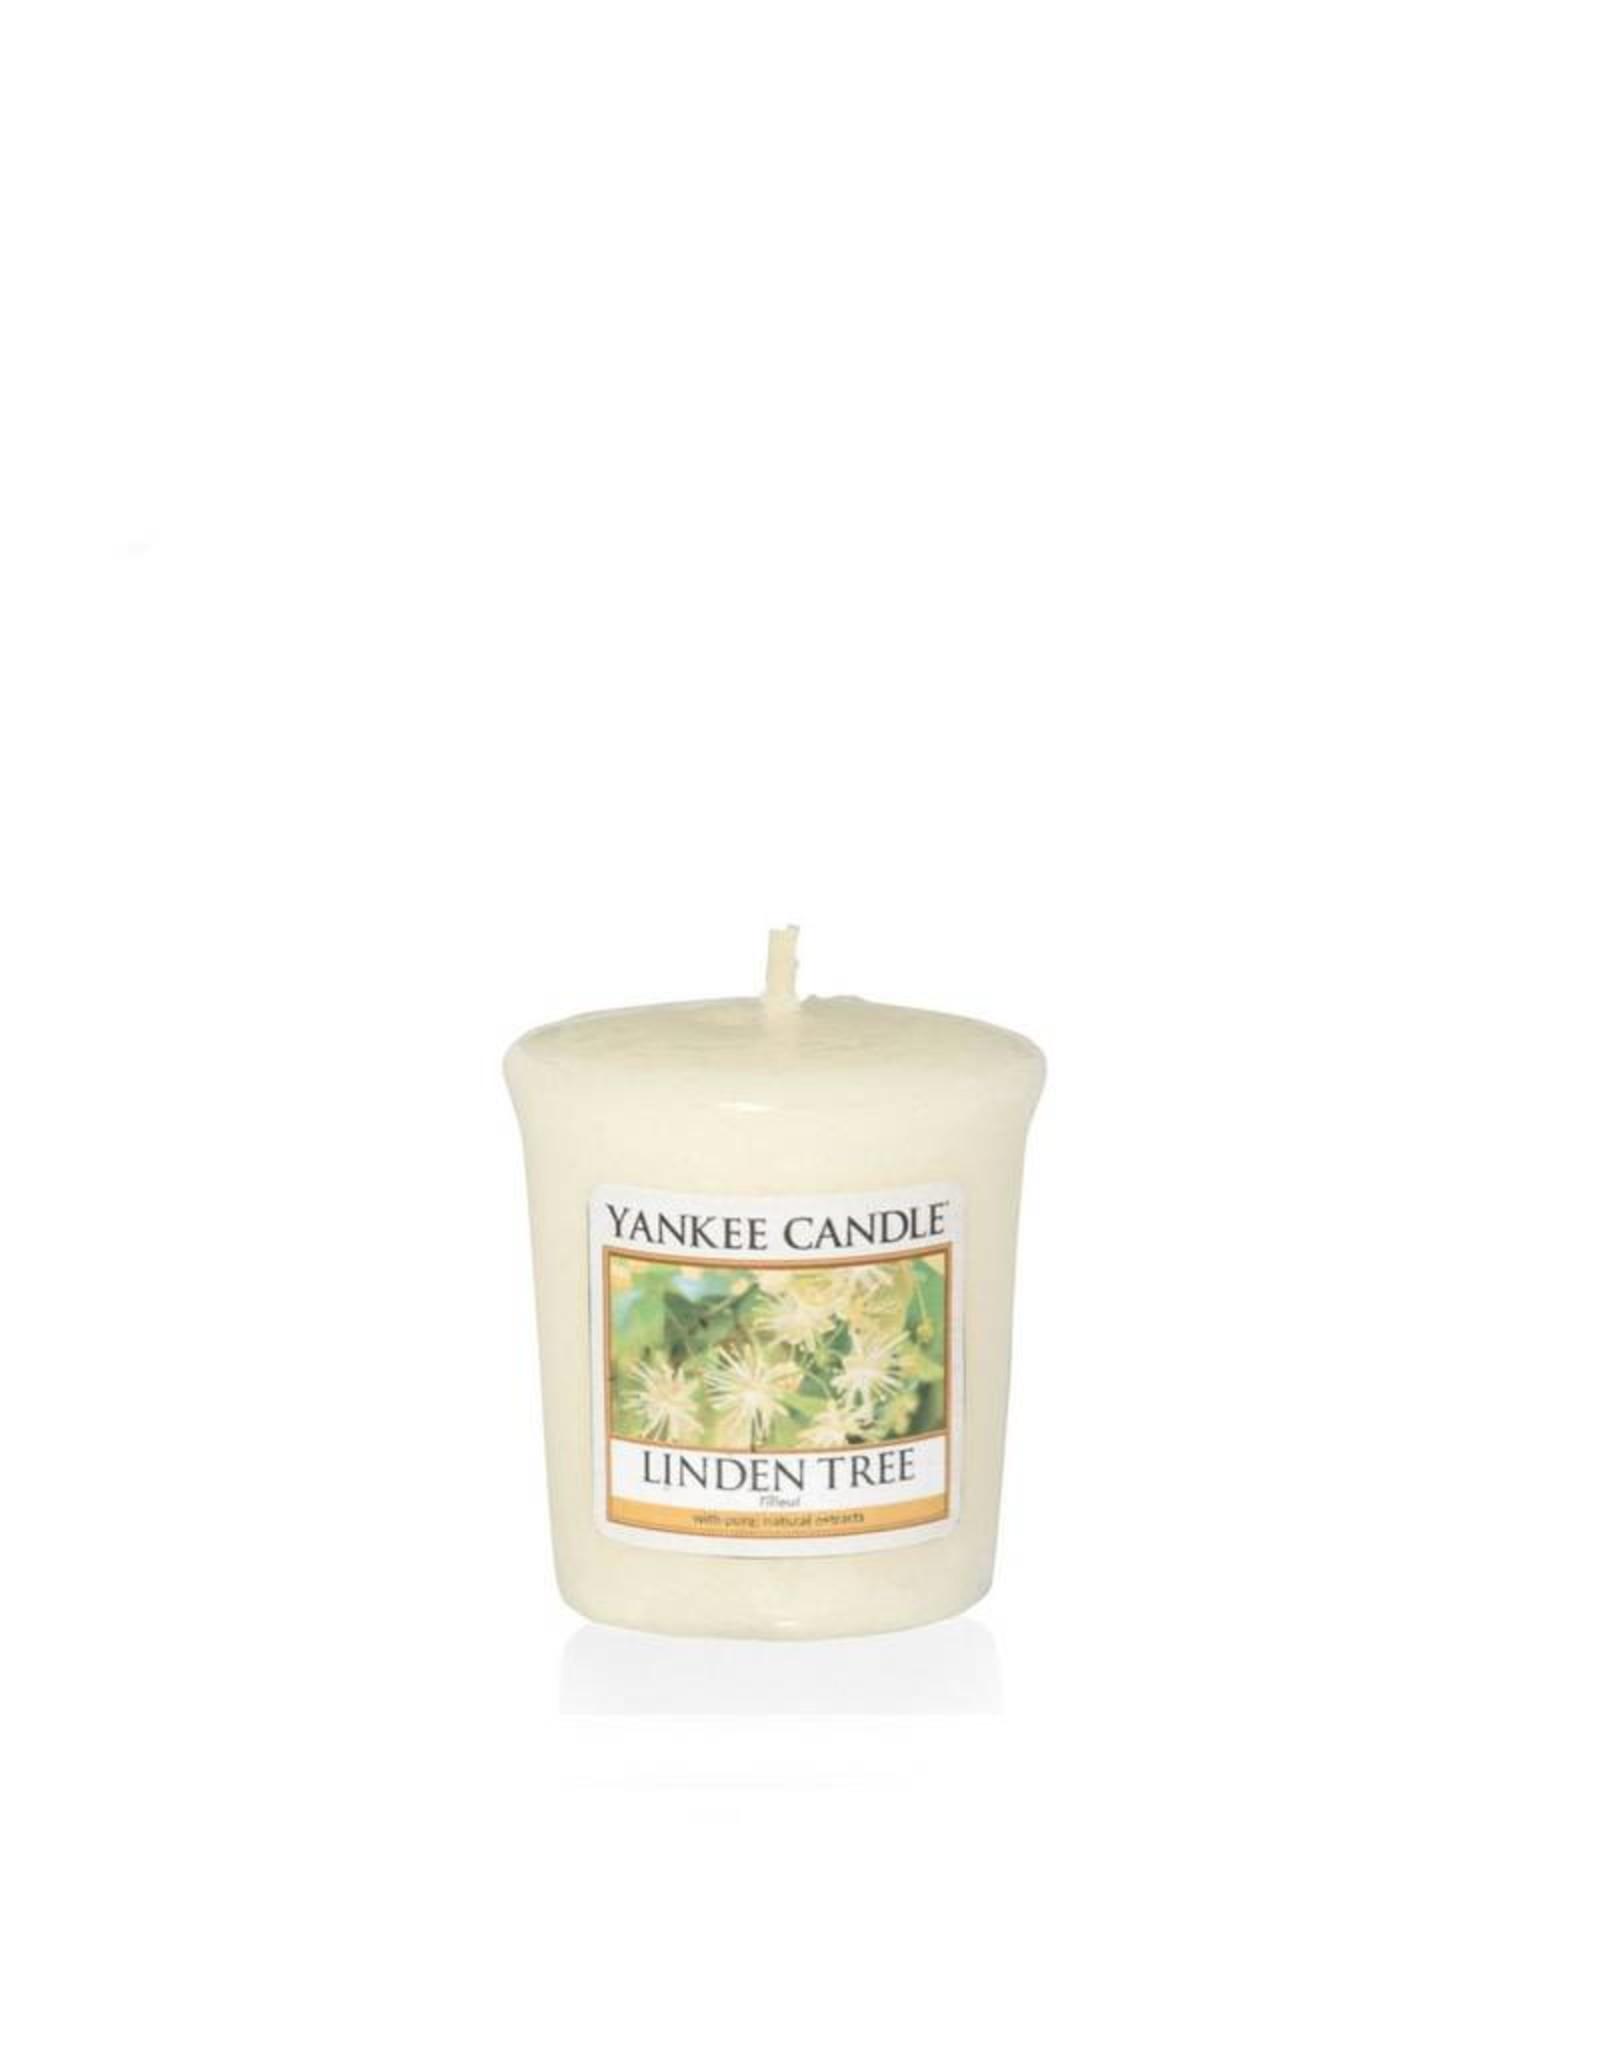 Yankee Candle Linden Tree Votive